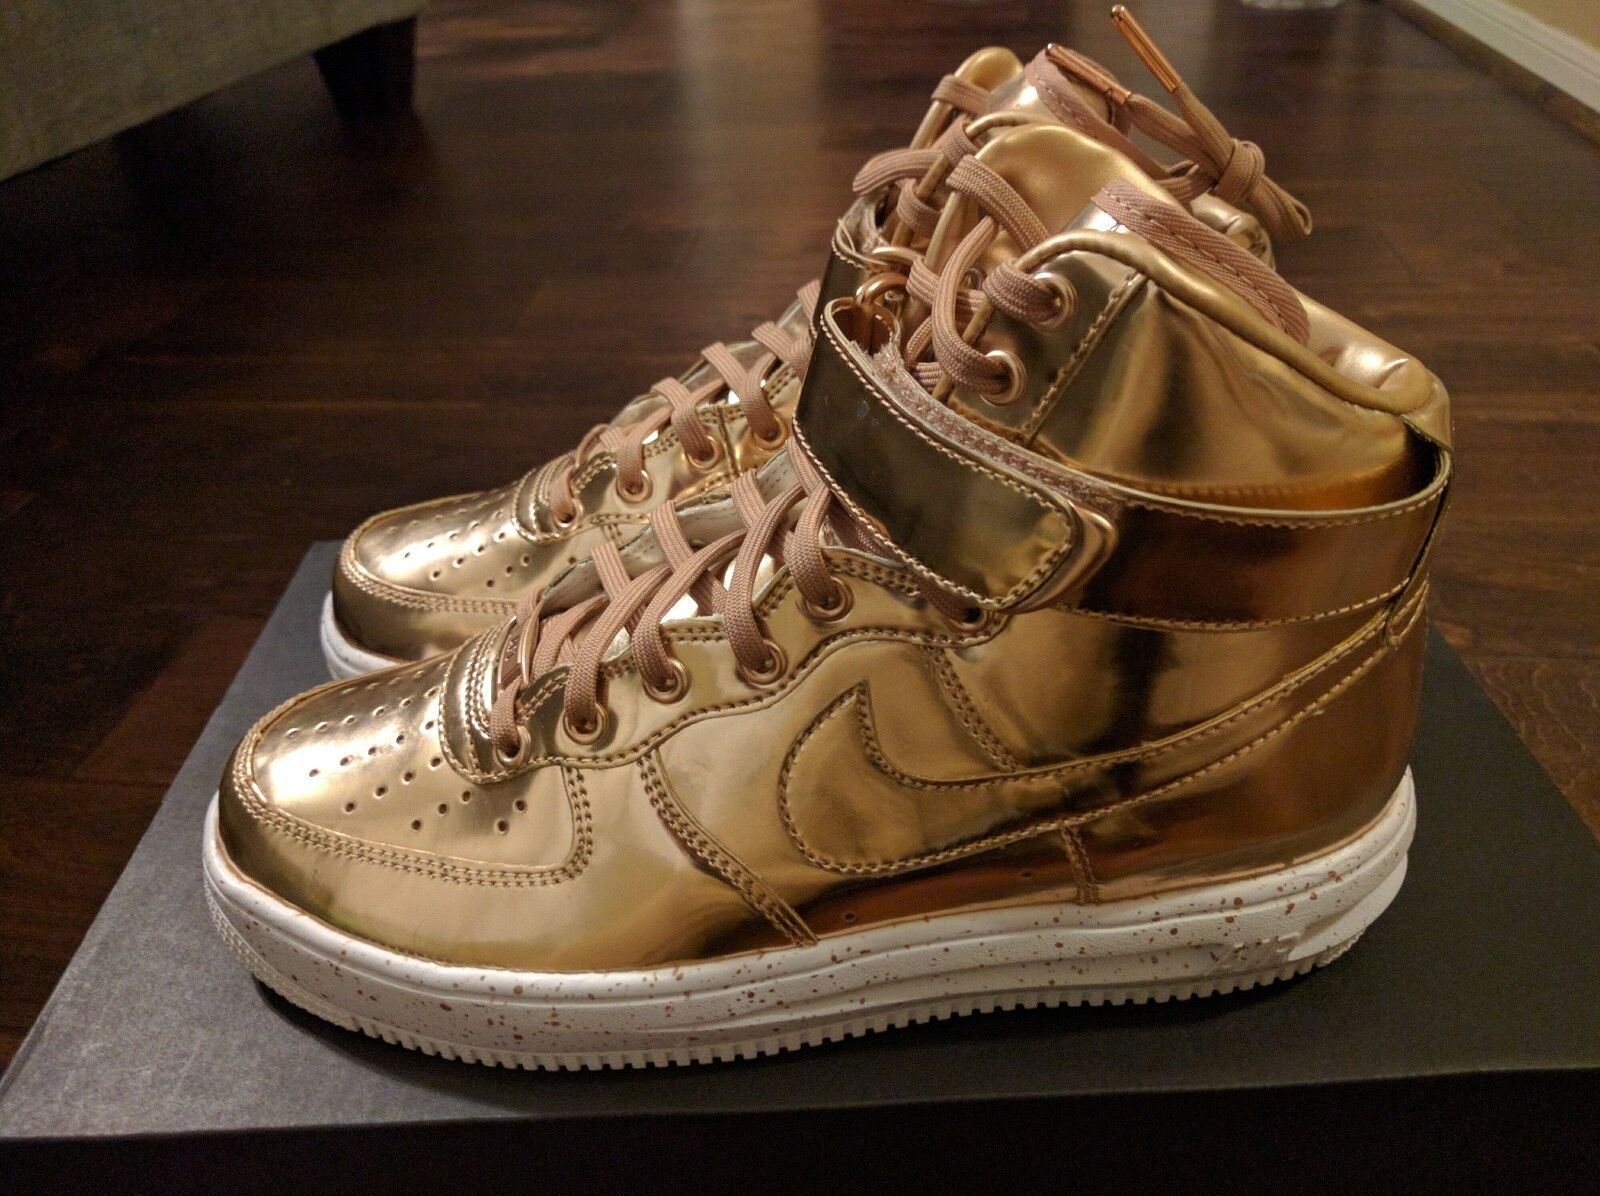 Nike Air Force 1 High iD Liquid Bronze Metallic Rose Gold Lunar Sneakerboots 8.5